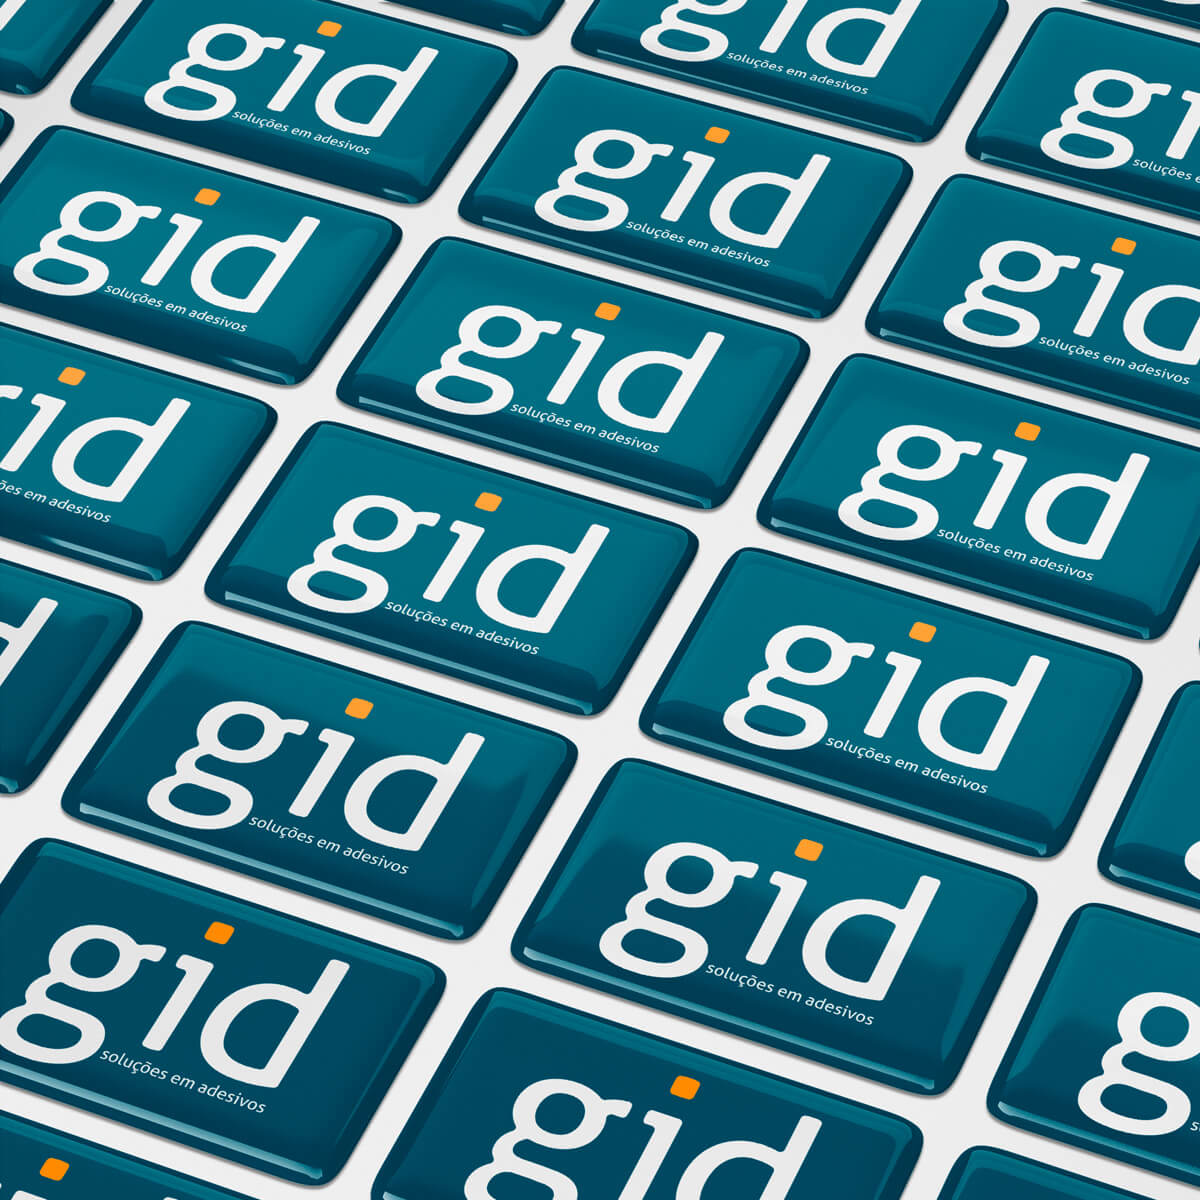 100 Etiquetas Adesivos Resinados Personalizados - 4x1,5cm